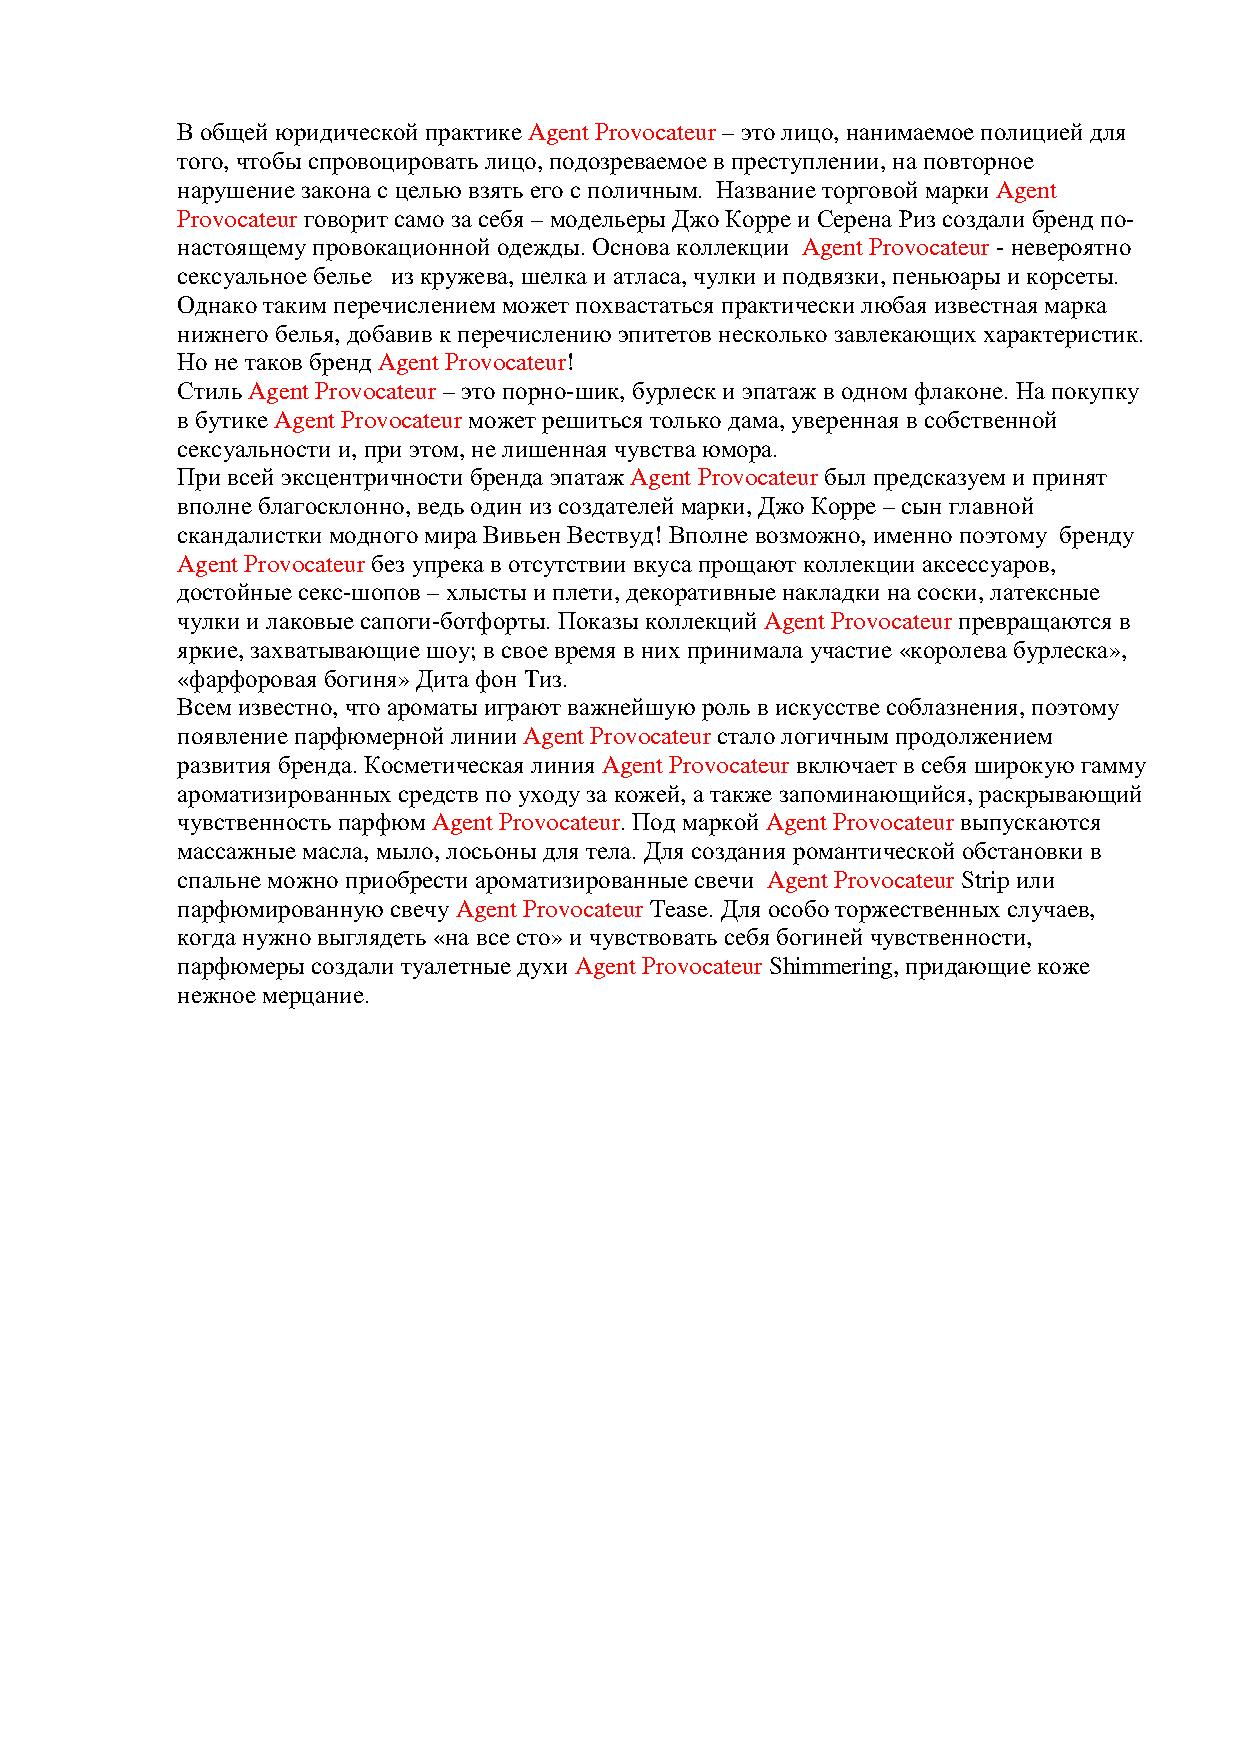 Agent Provocateur  (SEO, 16 ключей)